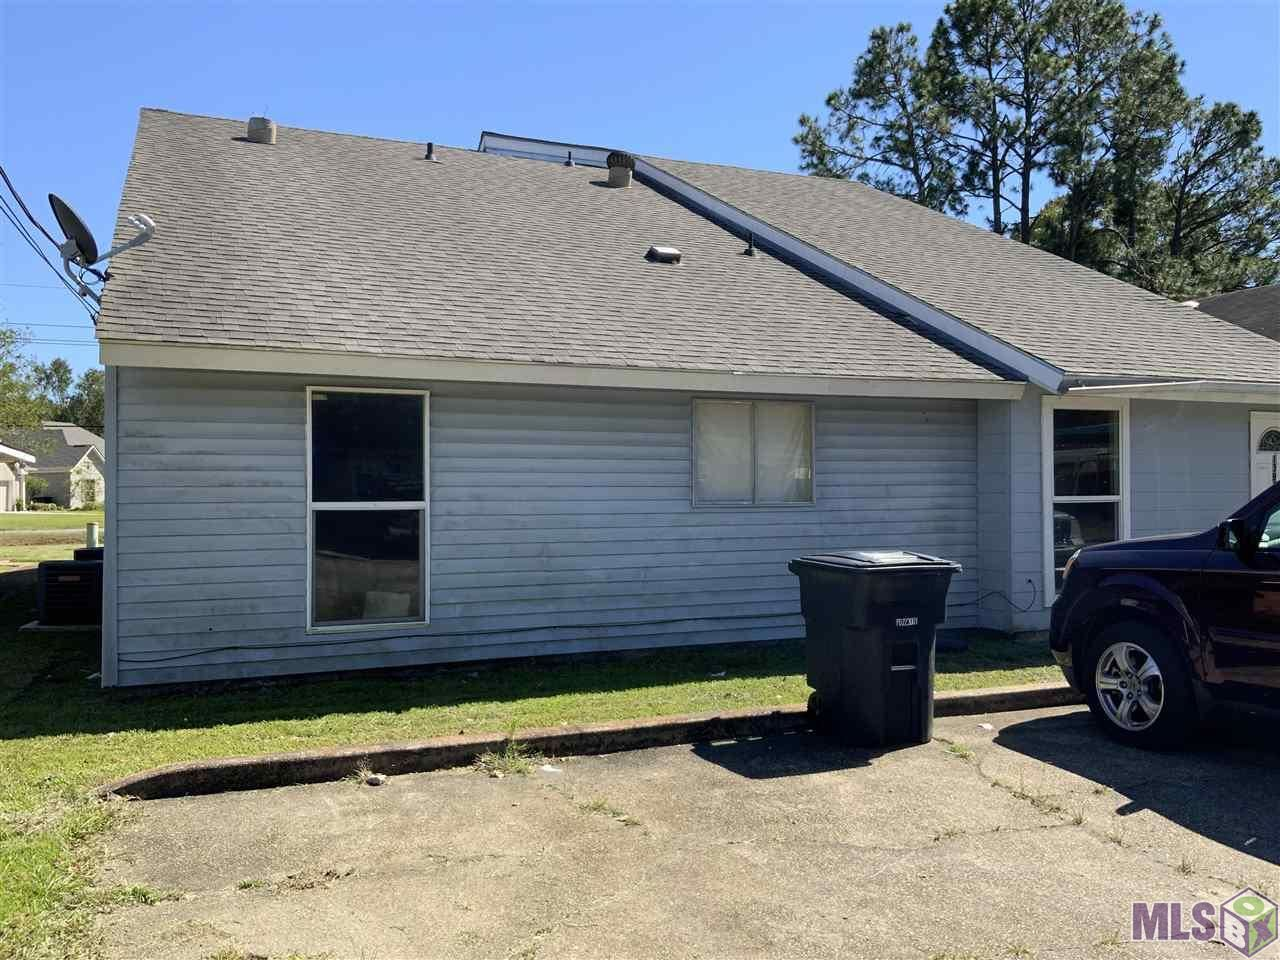 13933-35 OLD HAMMOND HWY, Baton Rouge, LA 70816 - MLS#: 2021015203